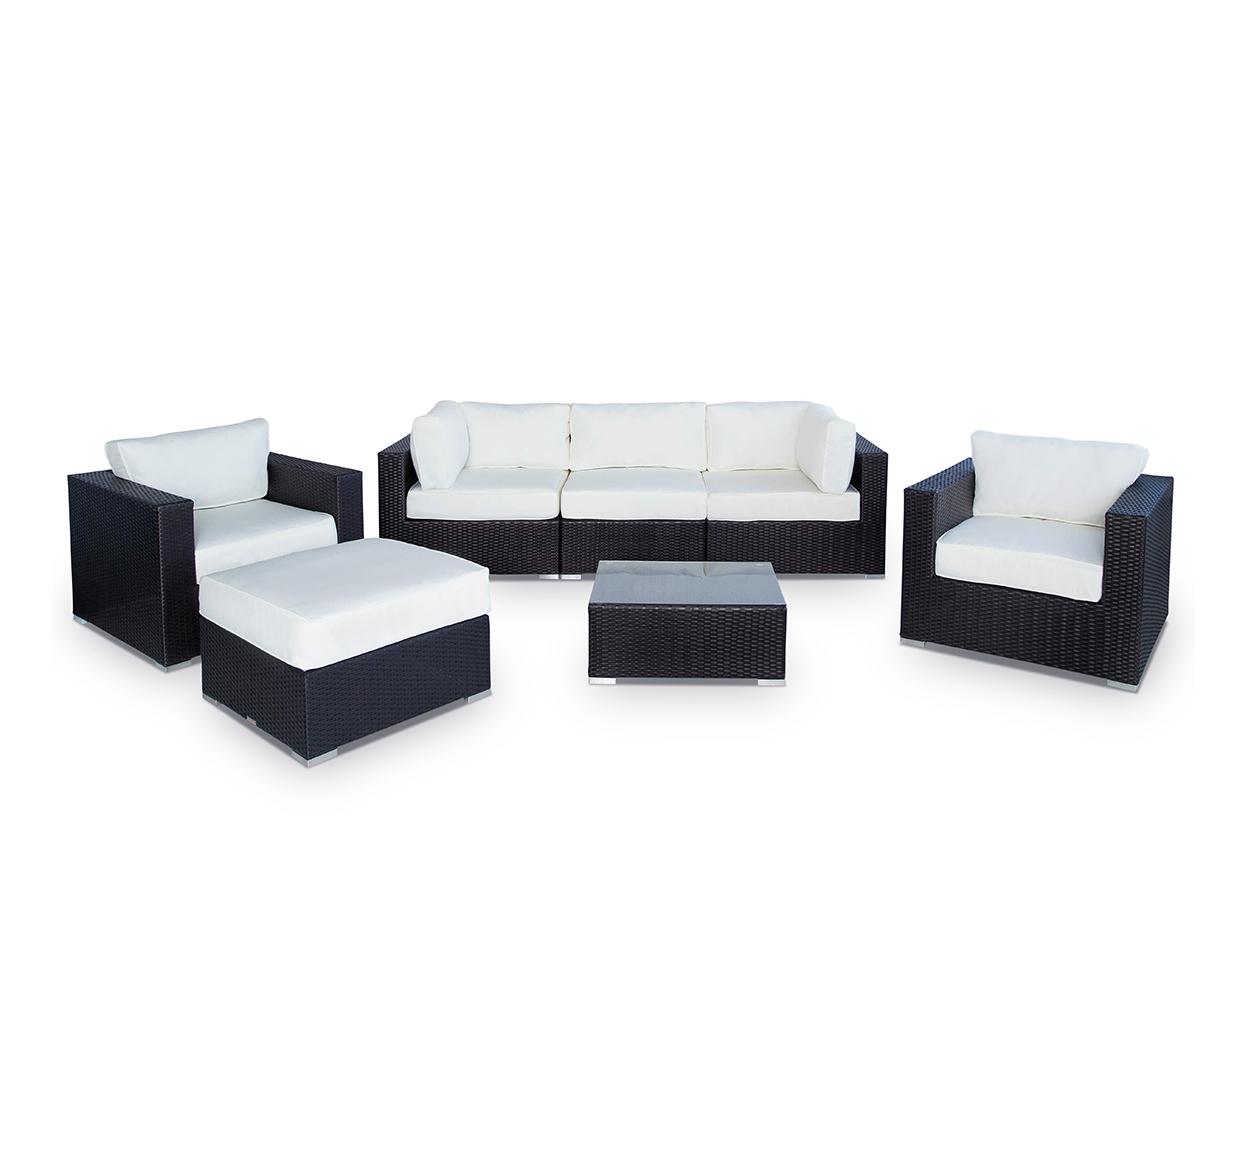 Swell Vilano 7 Pc Sofa Sectional W Ottoman Ibusinesslaw Wood Chair Design Ideas Ibusinesslaworg